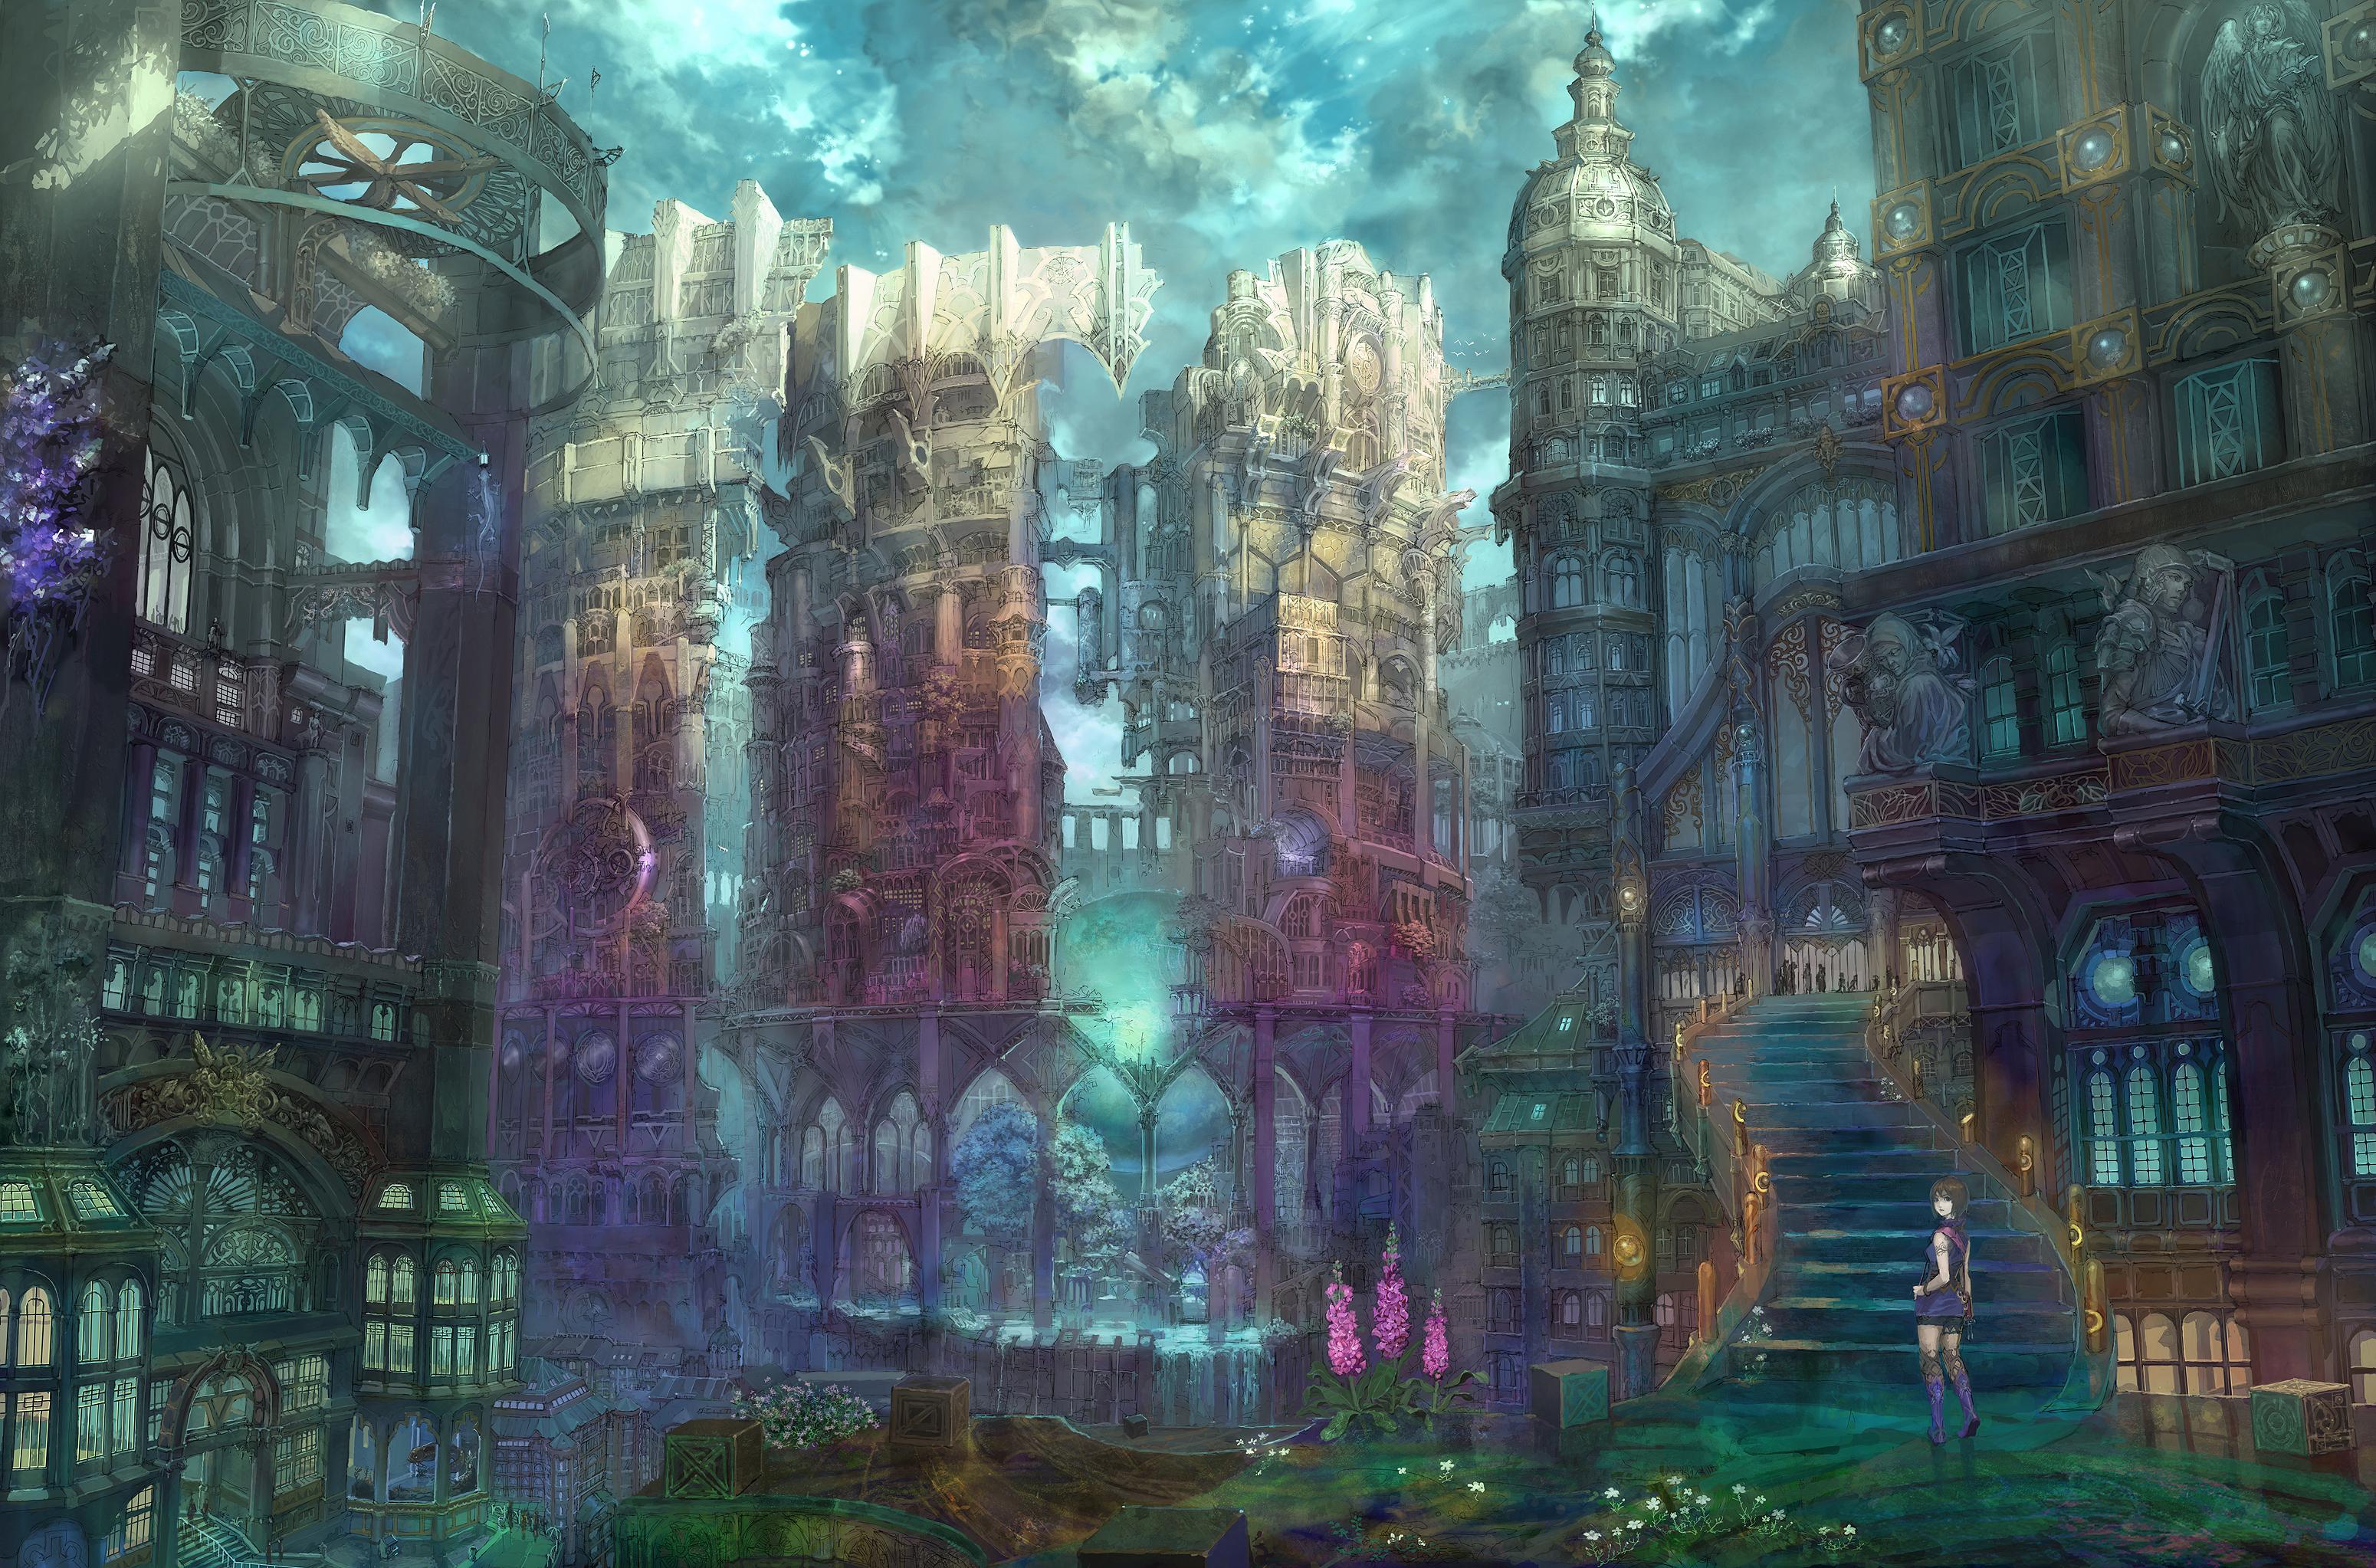 Картинки Аниме Фантастика Фантастический мир Здания Города 3100x2046 Фэнтези Дома город